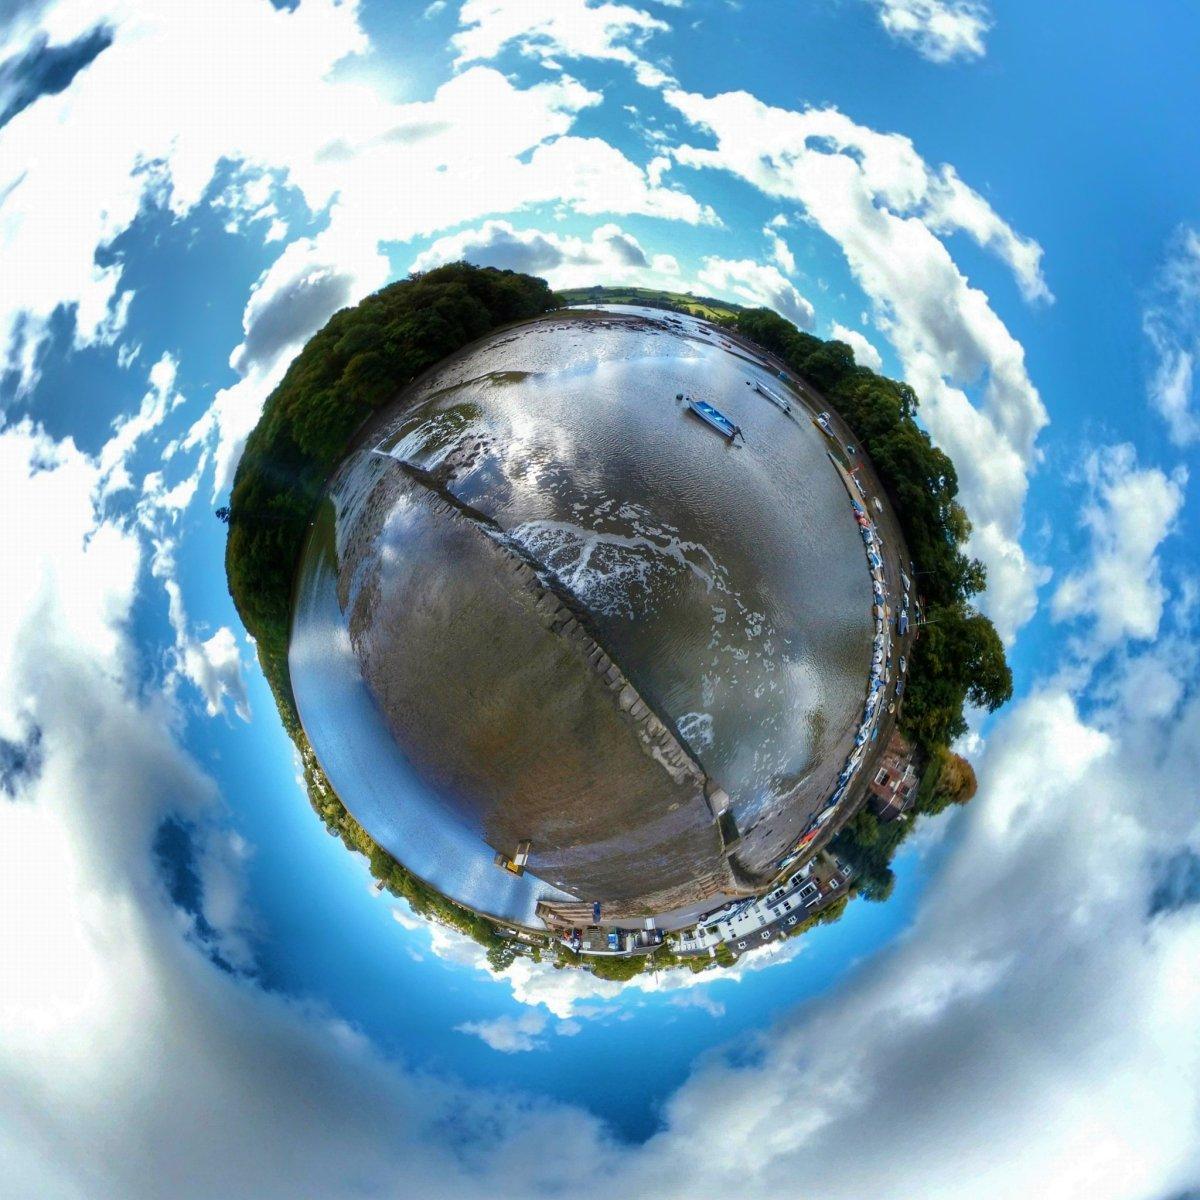 Stoke Gabriel dam, Paignton, Tiny Planet